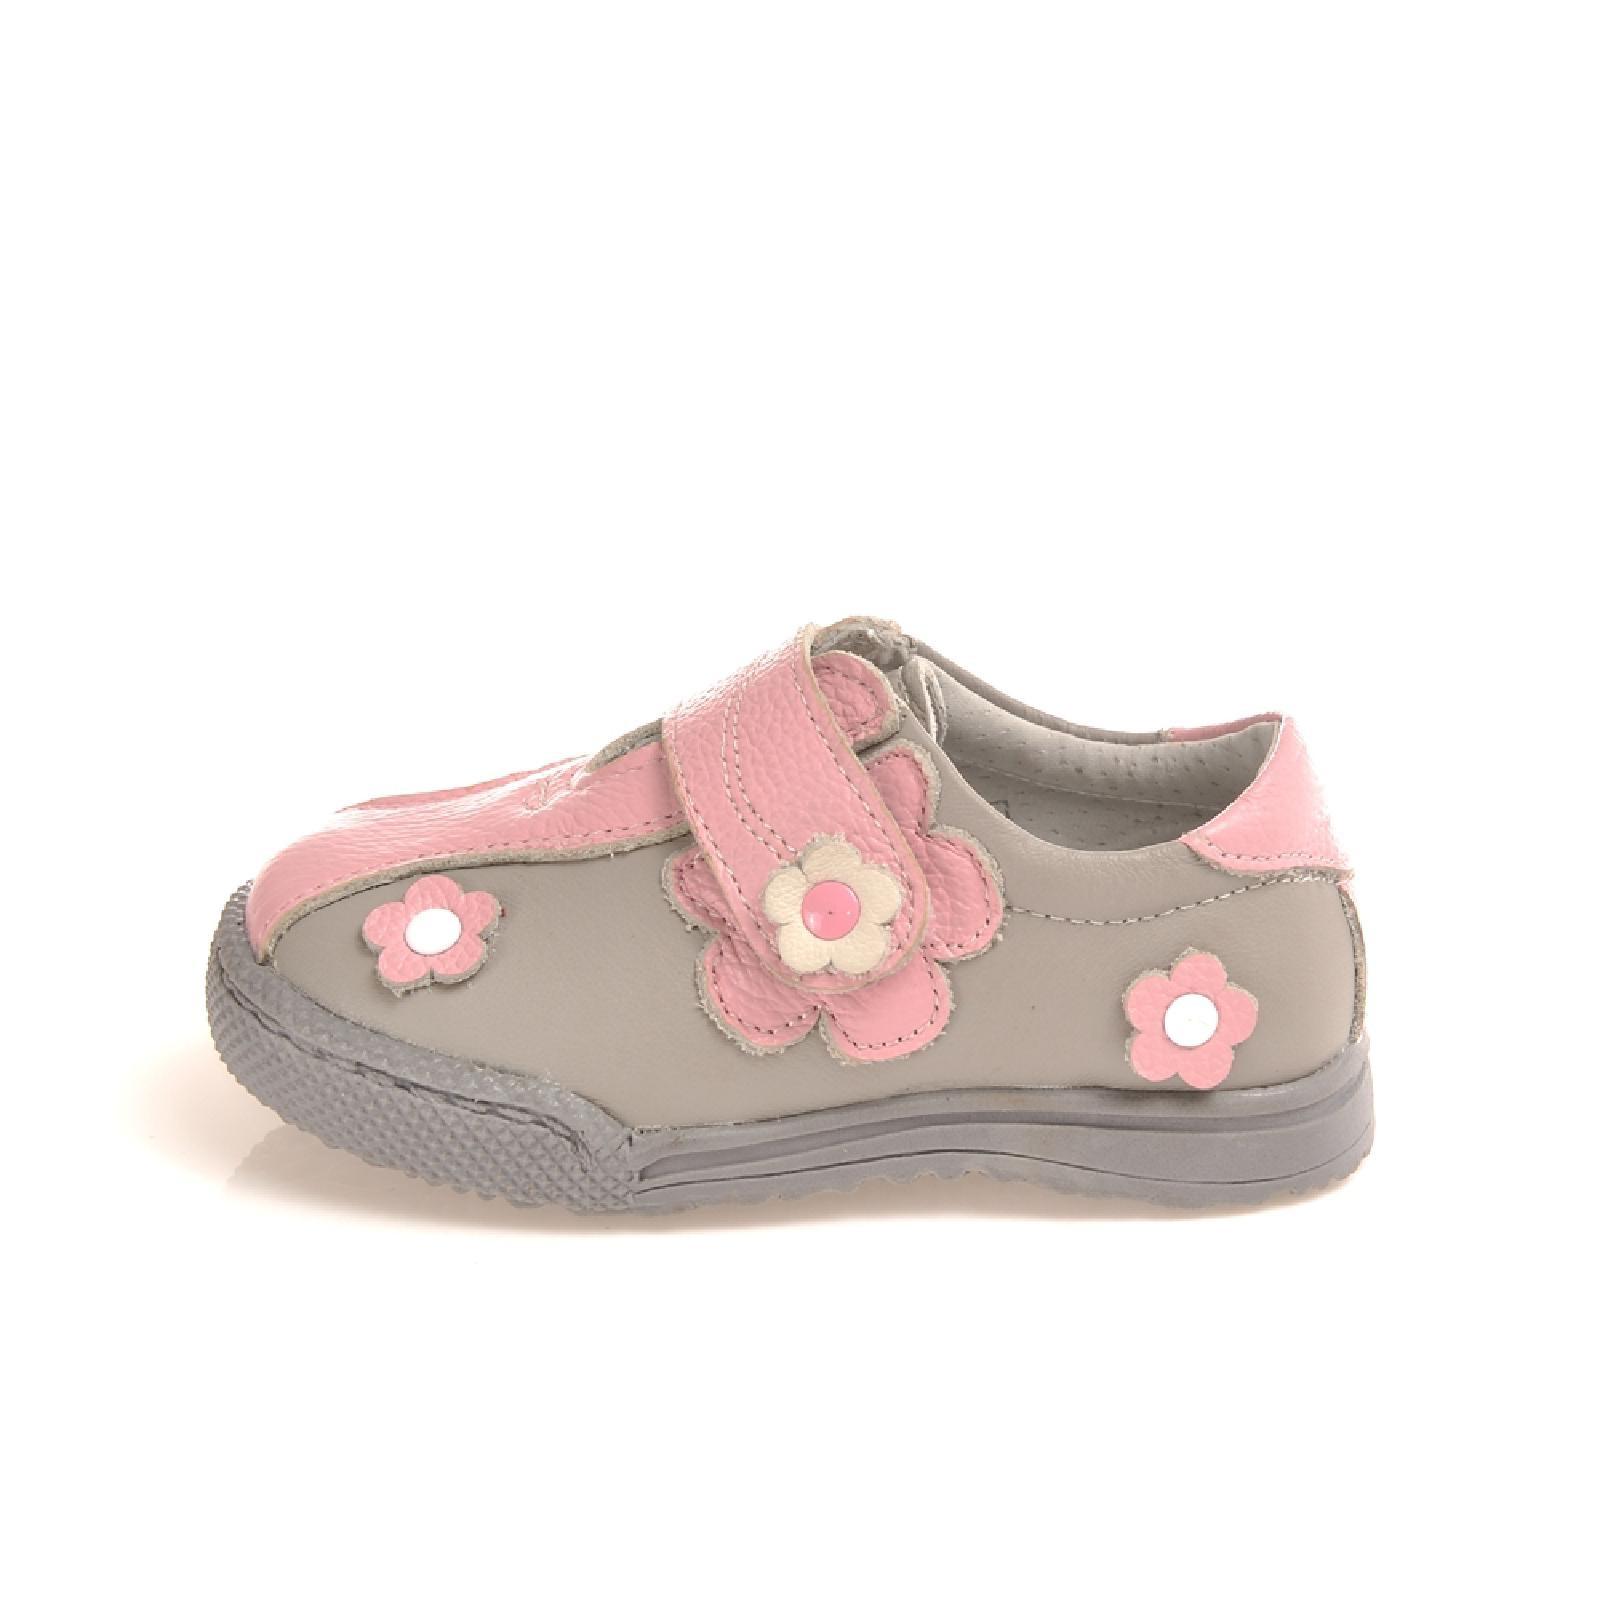 b0a2b3c1364142 Caroch Mädchen Sneaker Kinderschuhe aus Leder in rosa hellgrau ...